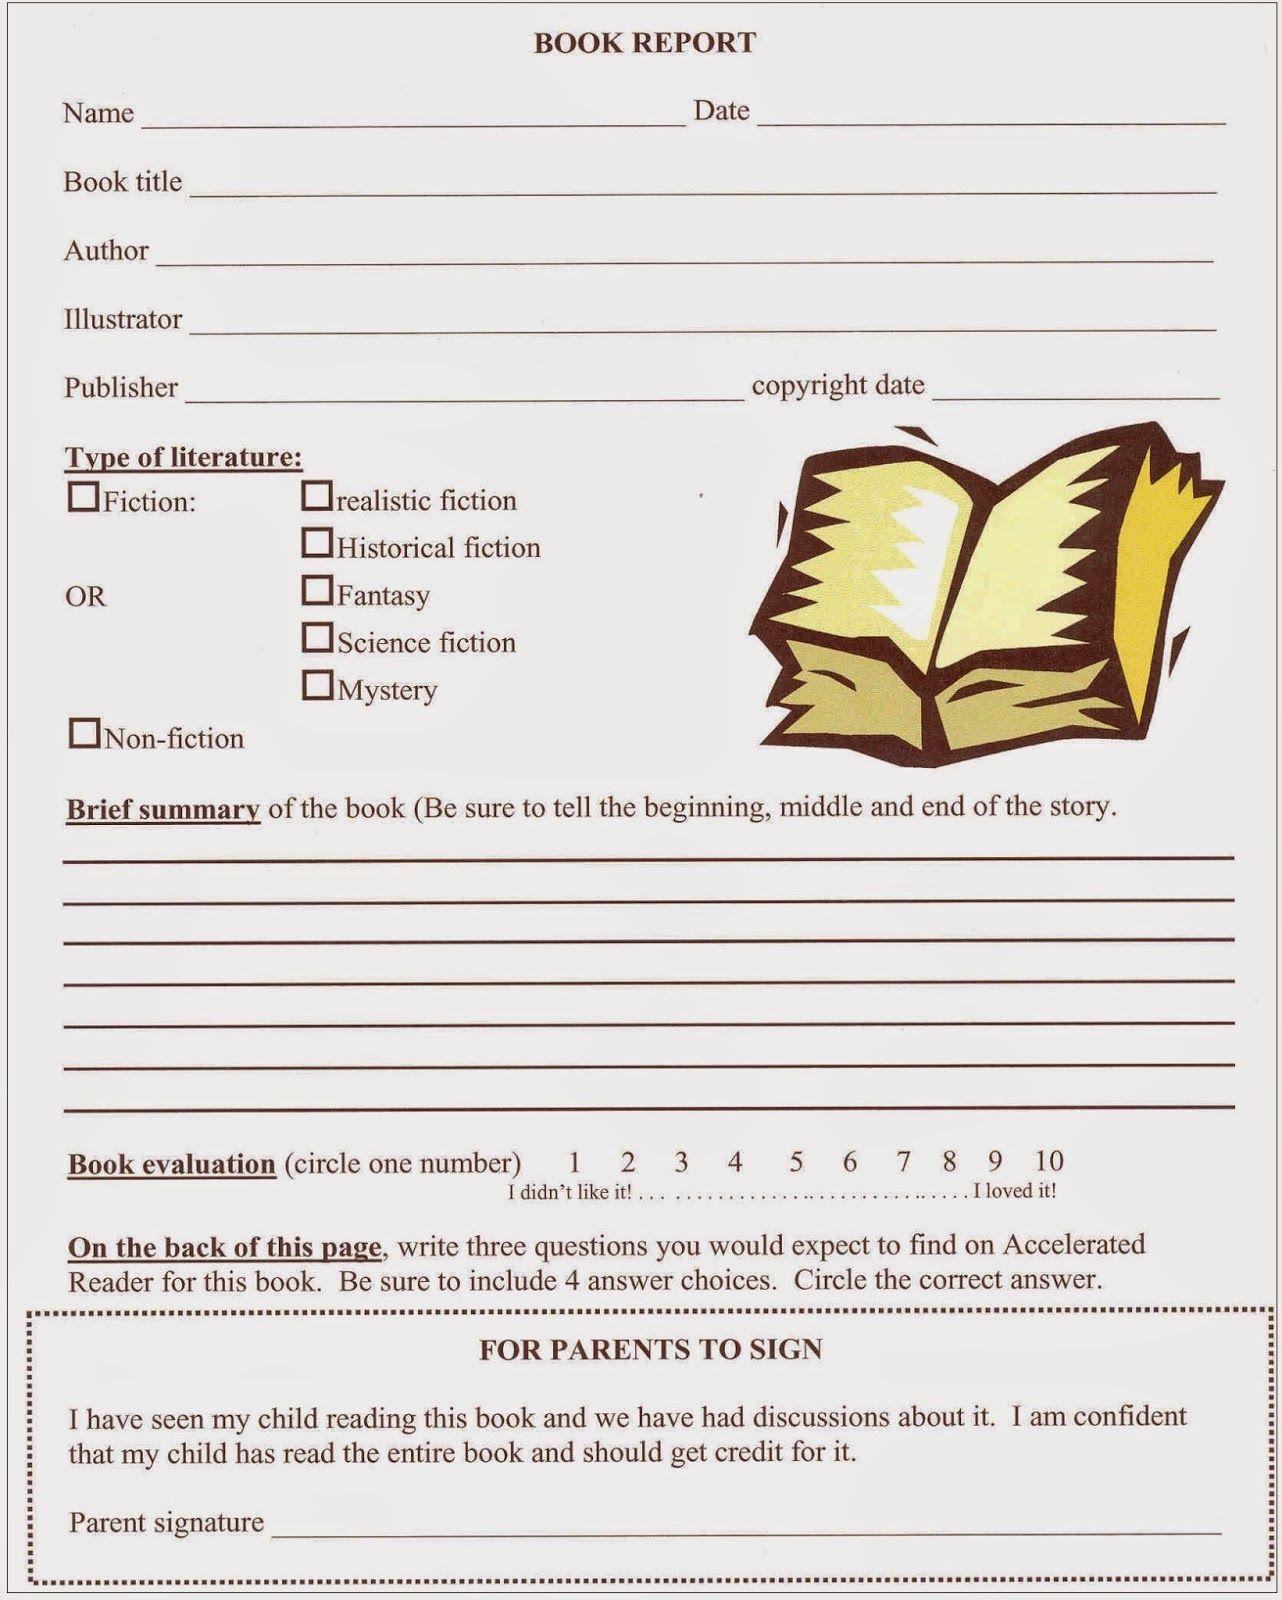 Tales Of A Fourth Grade Tartan Fourth Quarter Book Report Dates Book Report Templates Biography Book Report Template Book Report